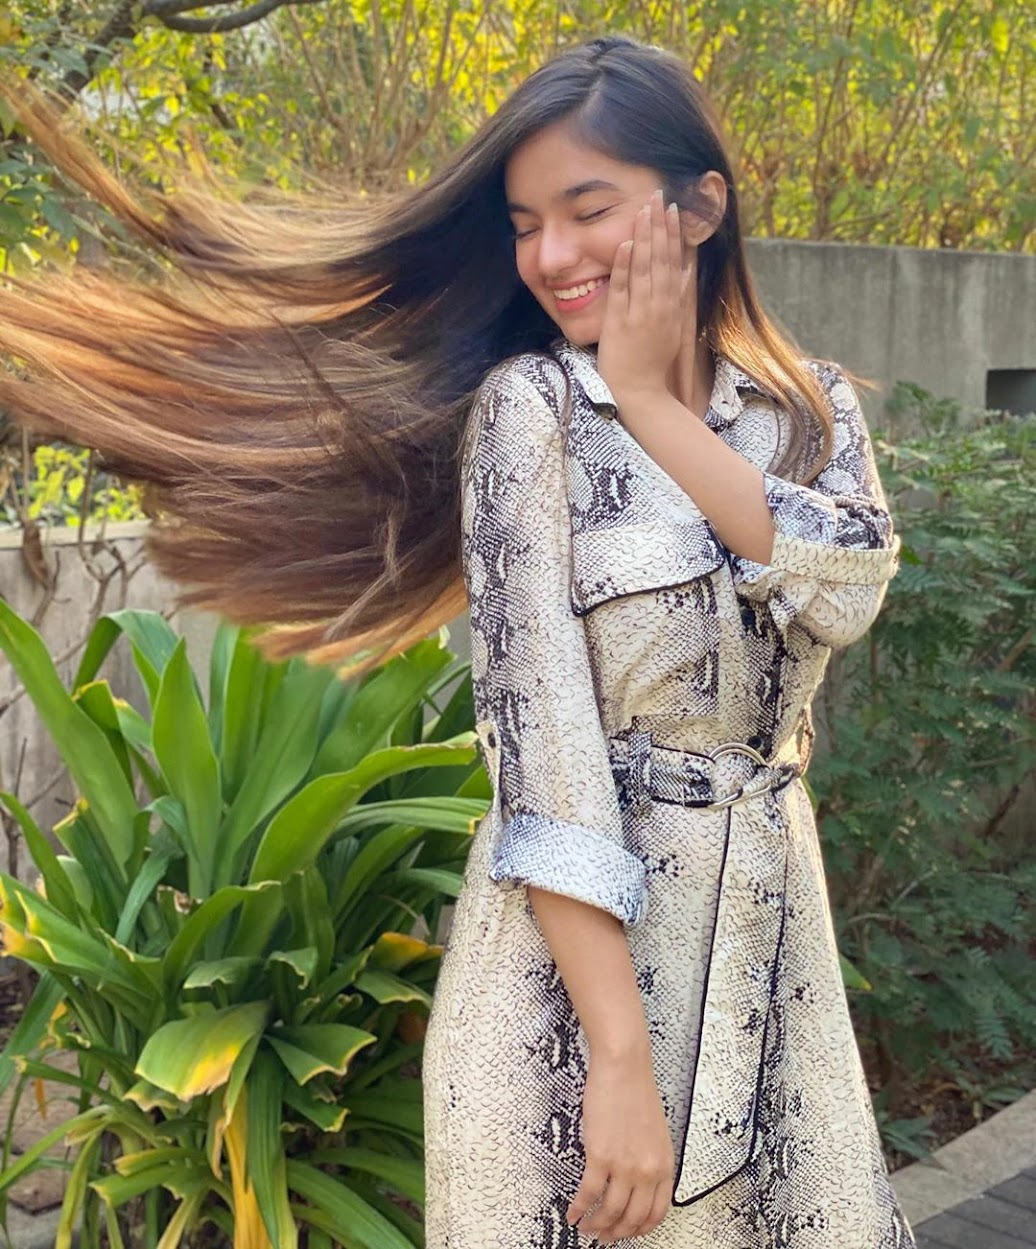 Anushka-Sen-hair-HD-photo-getpics